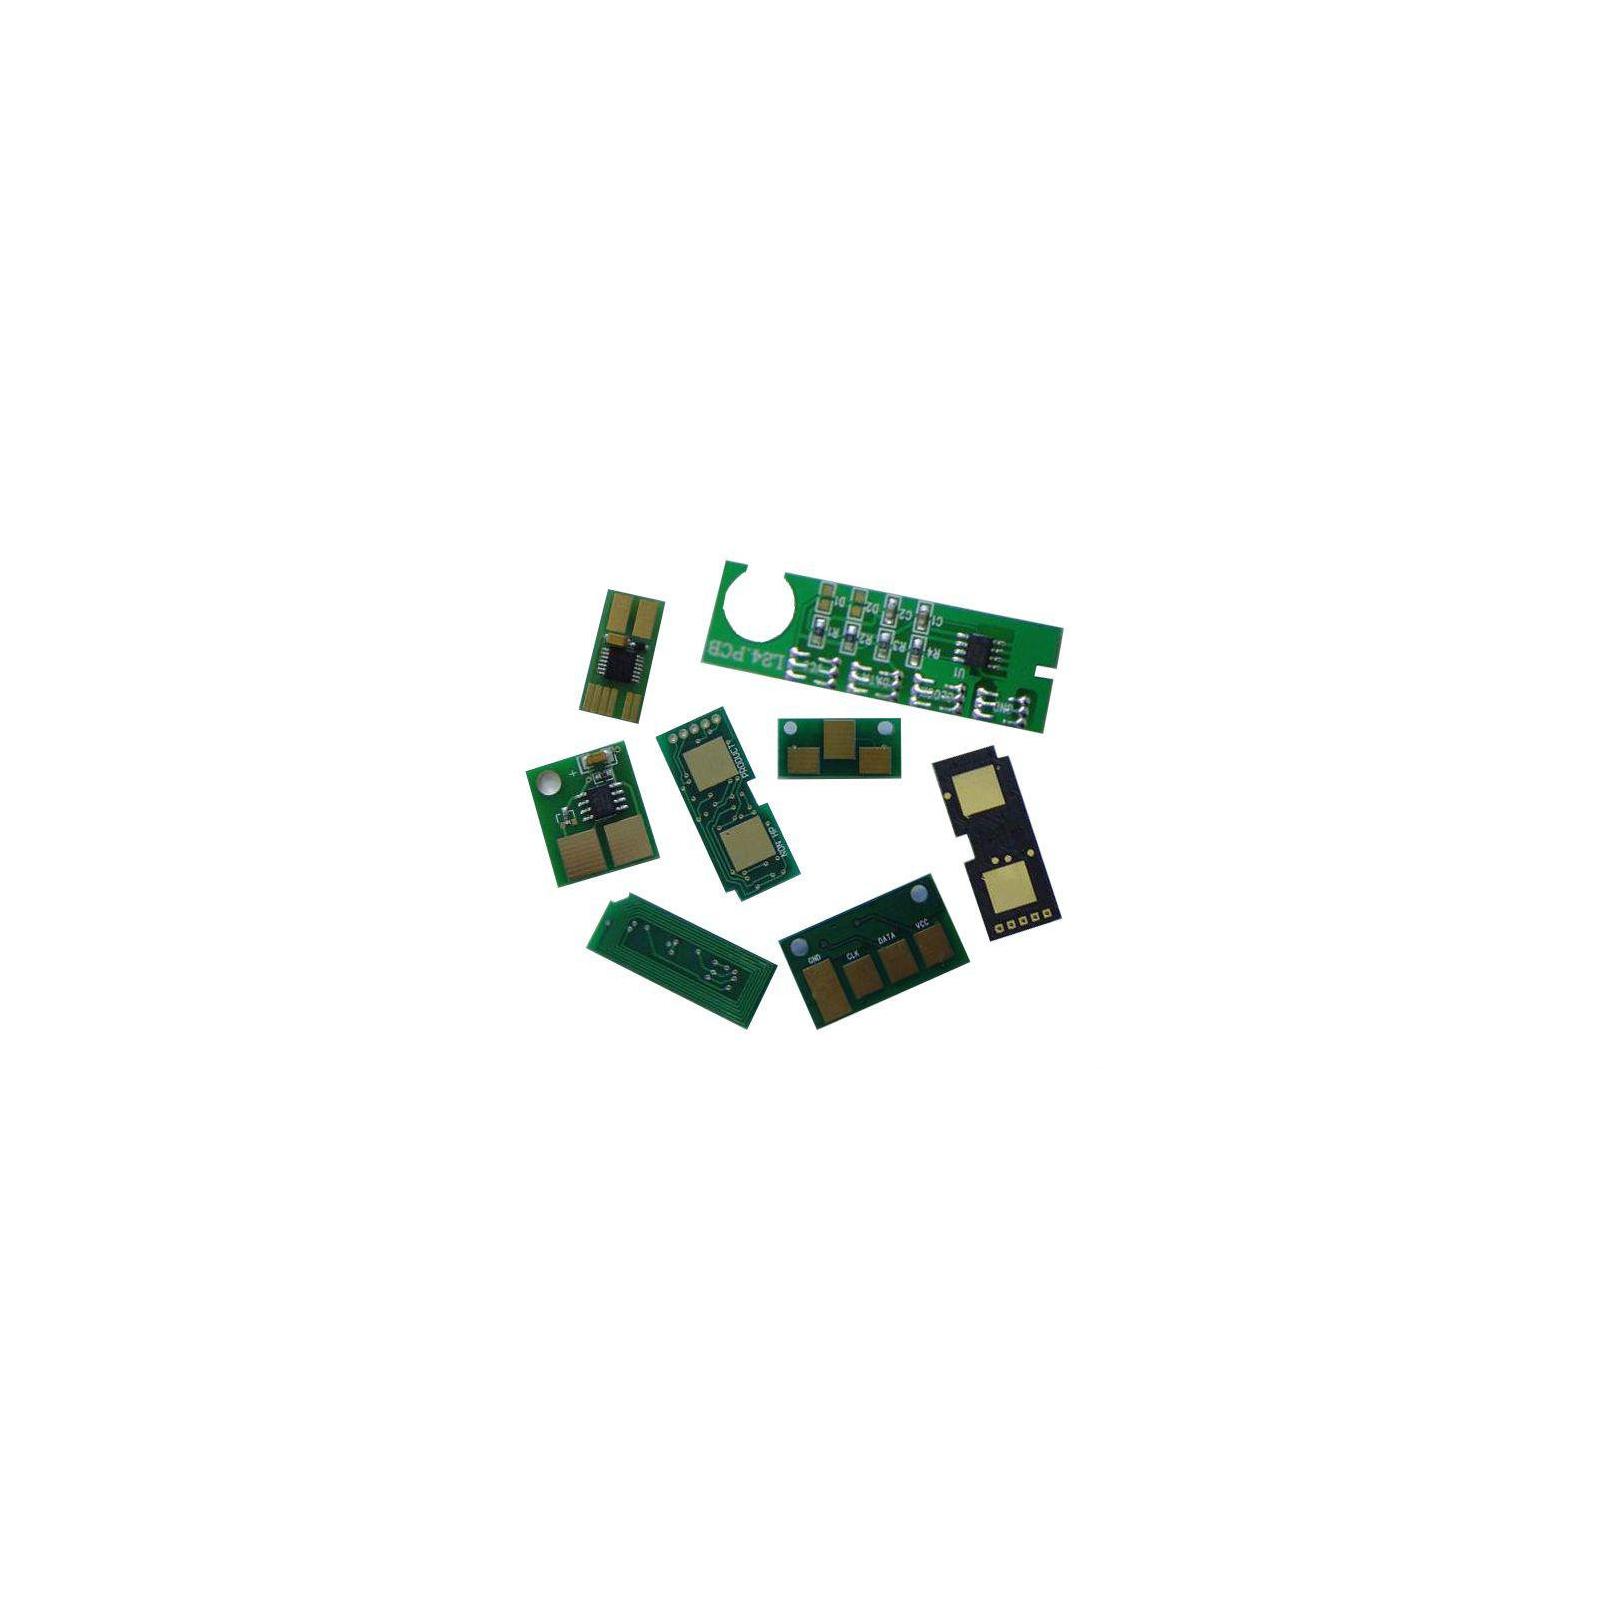 Чип для картриджа XEROX PH4600/4620 106R04000 40K Everprint (CHIP-XER-4600-40K)